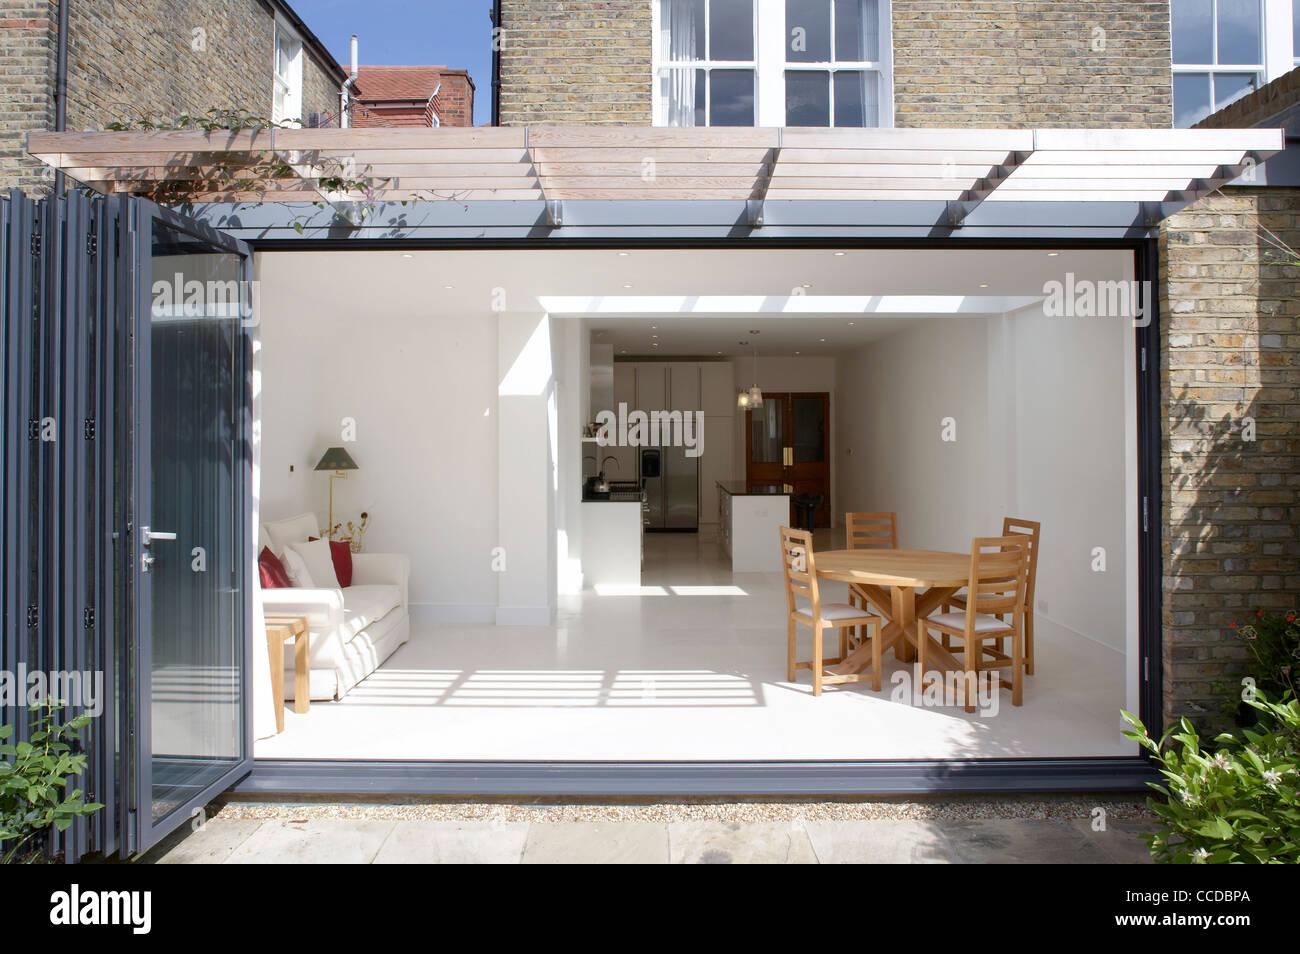 Giles Pike Architects Stockfotos & Giles Pike Architects Bilder - Alamy